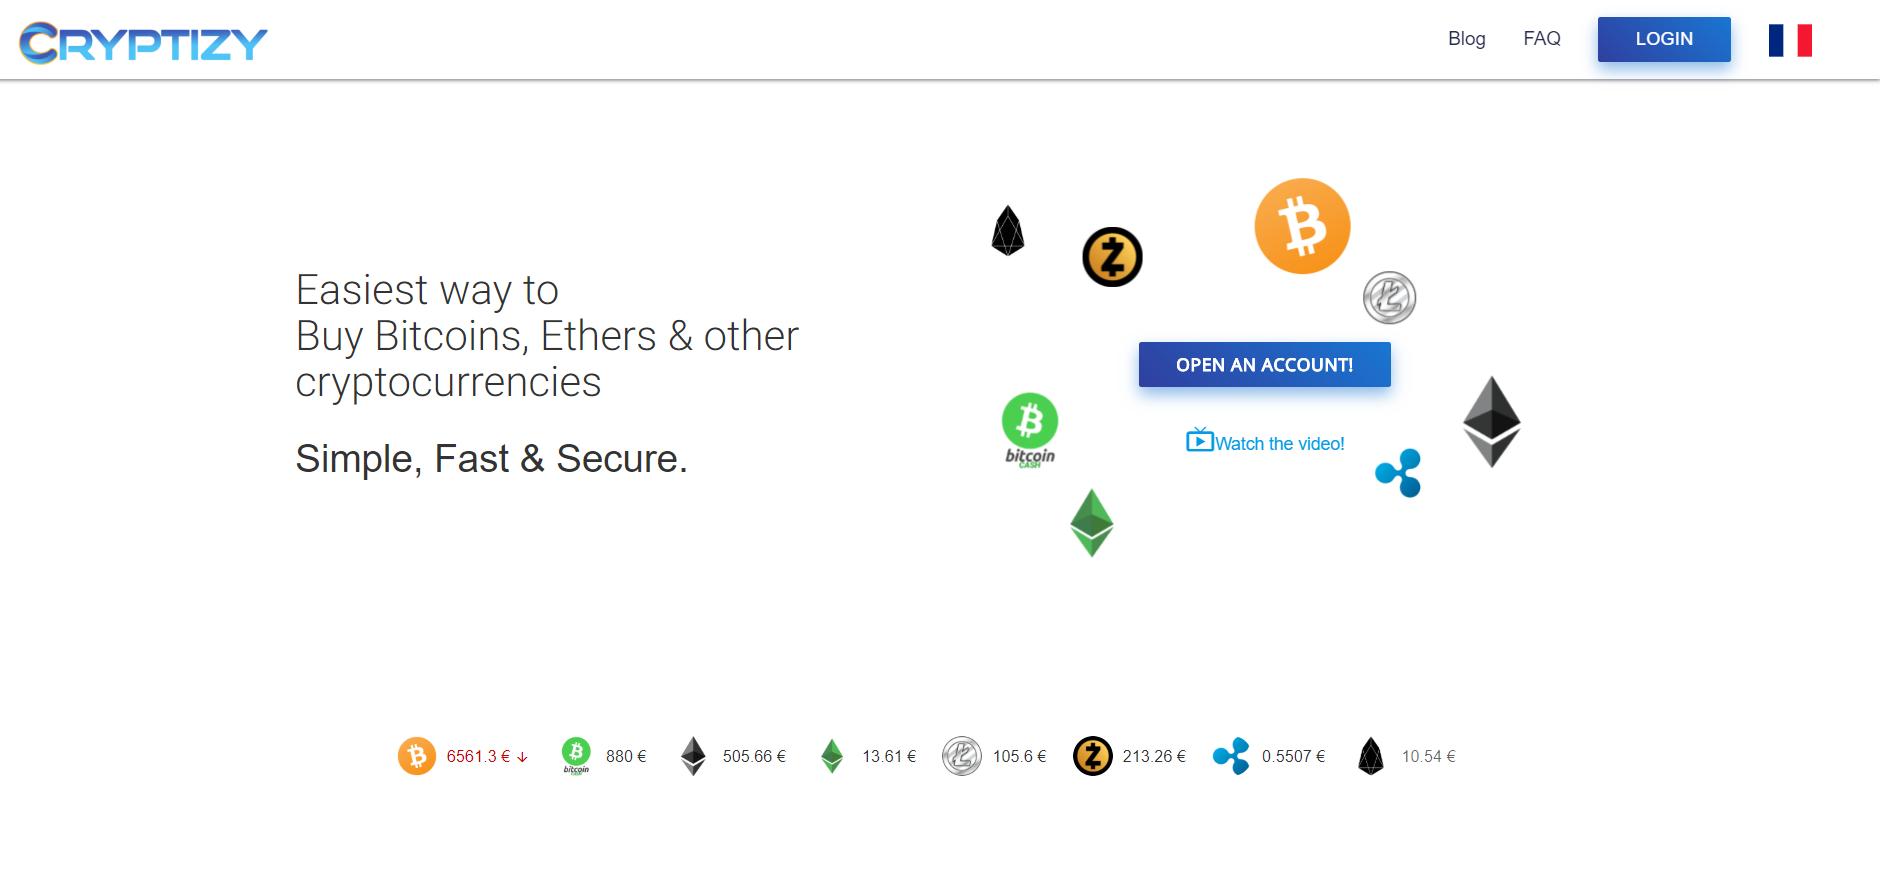 Cryptizy screenshot